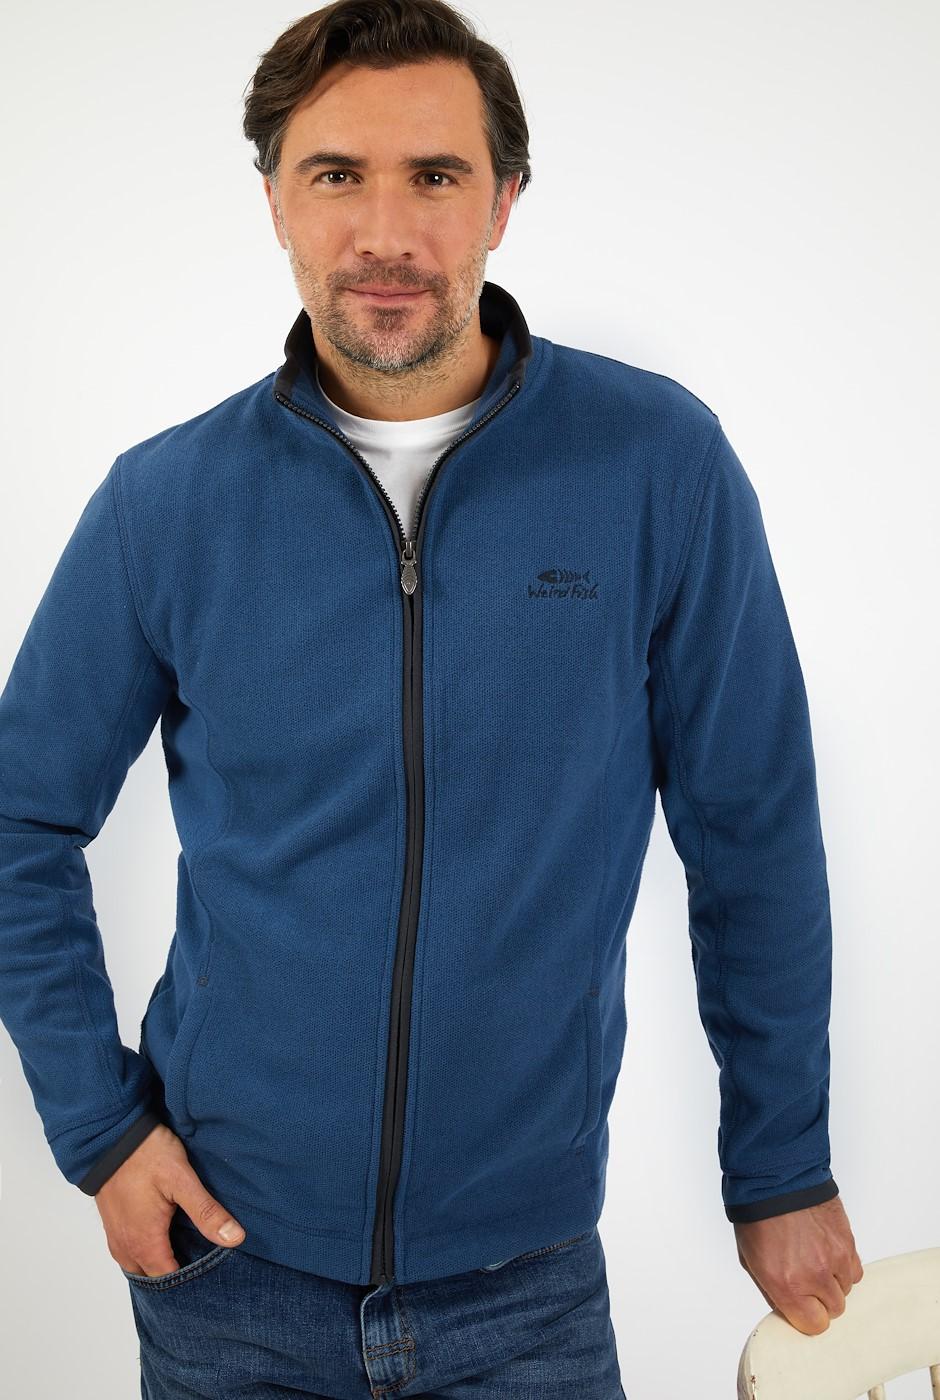 Manet Full Zip Birdseye Fleece Ensign Blue